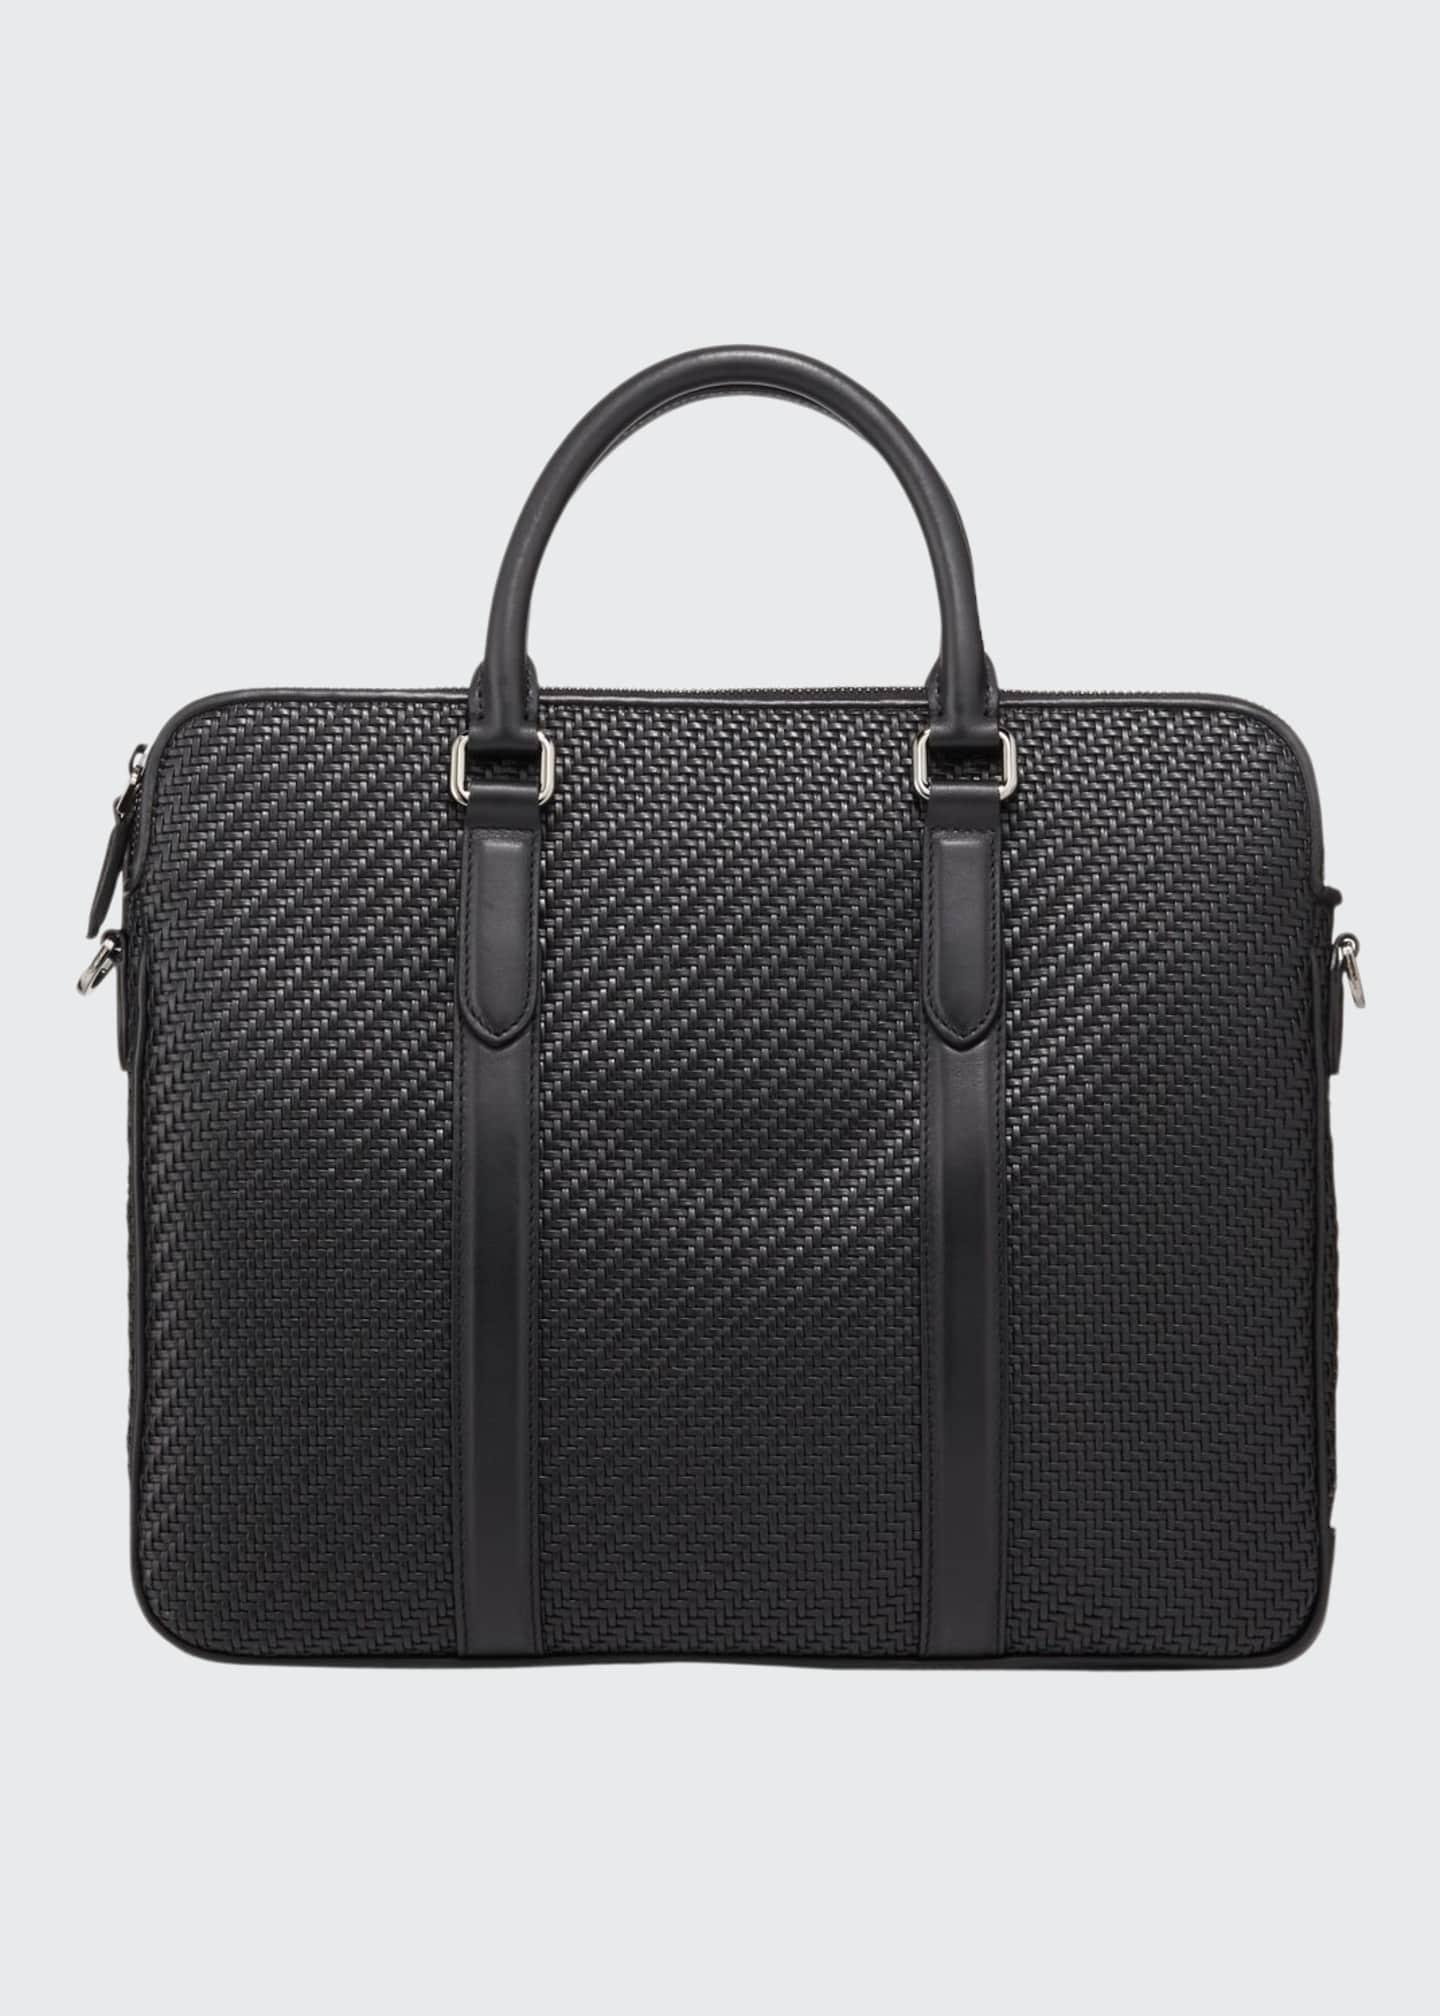 Ermenegildo Zegna Men's Pelle Tessuta Business Bag